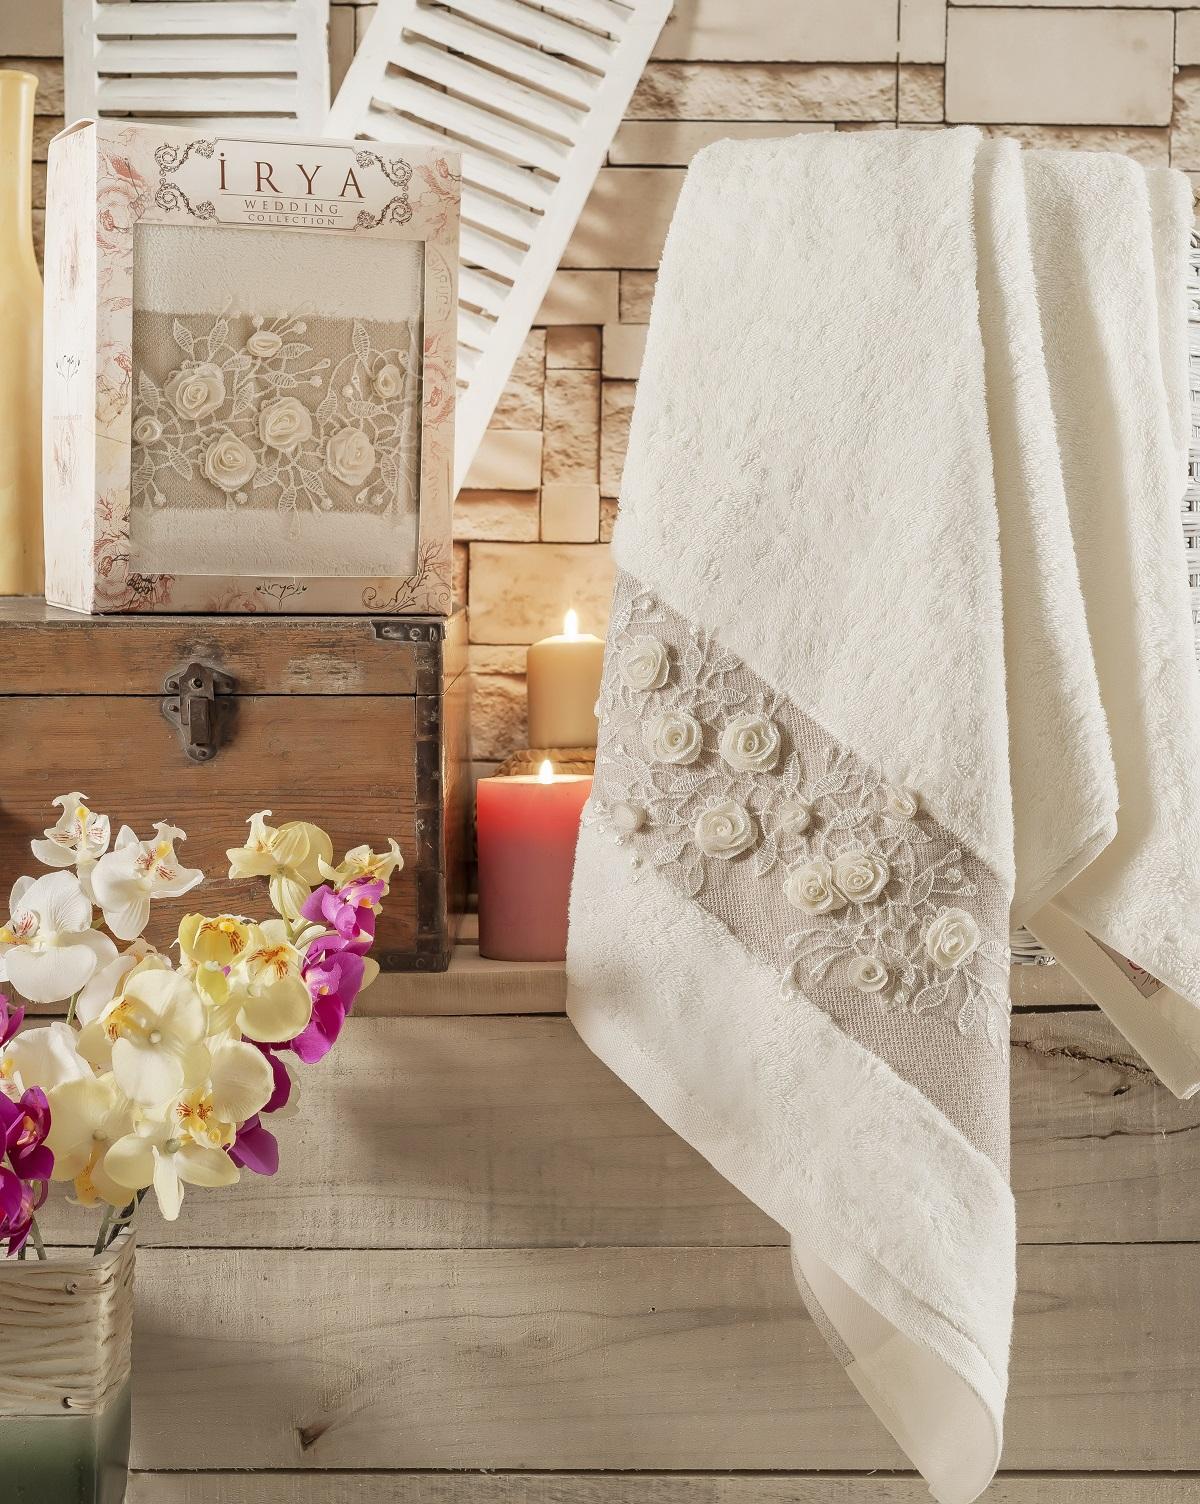 Купить Полотенца IRYA, Полотенце Heaven Цвет: Молочный (85х150 см), Турция, Бежевый, Махра